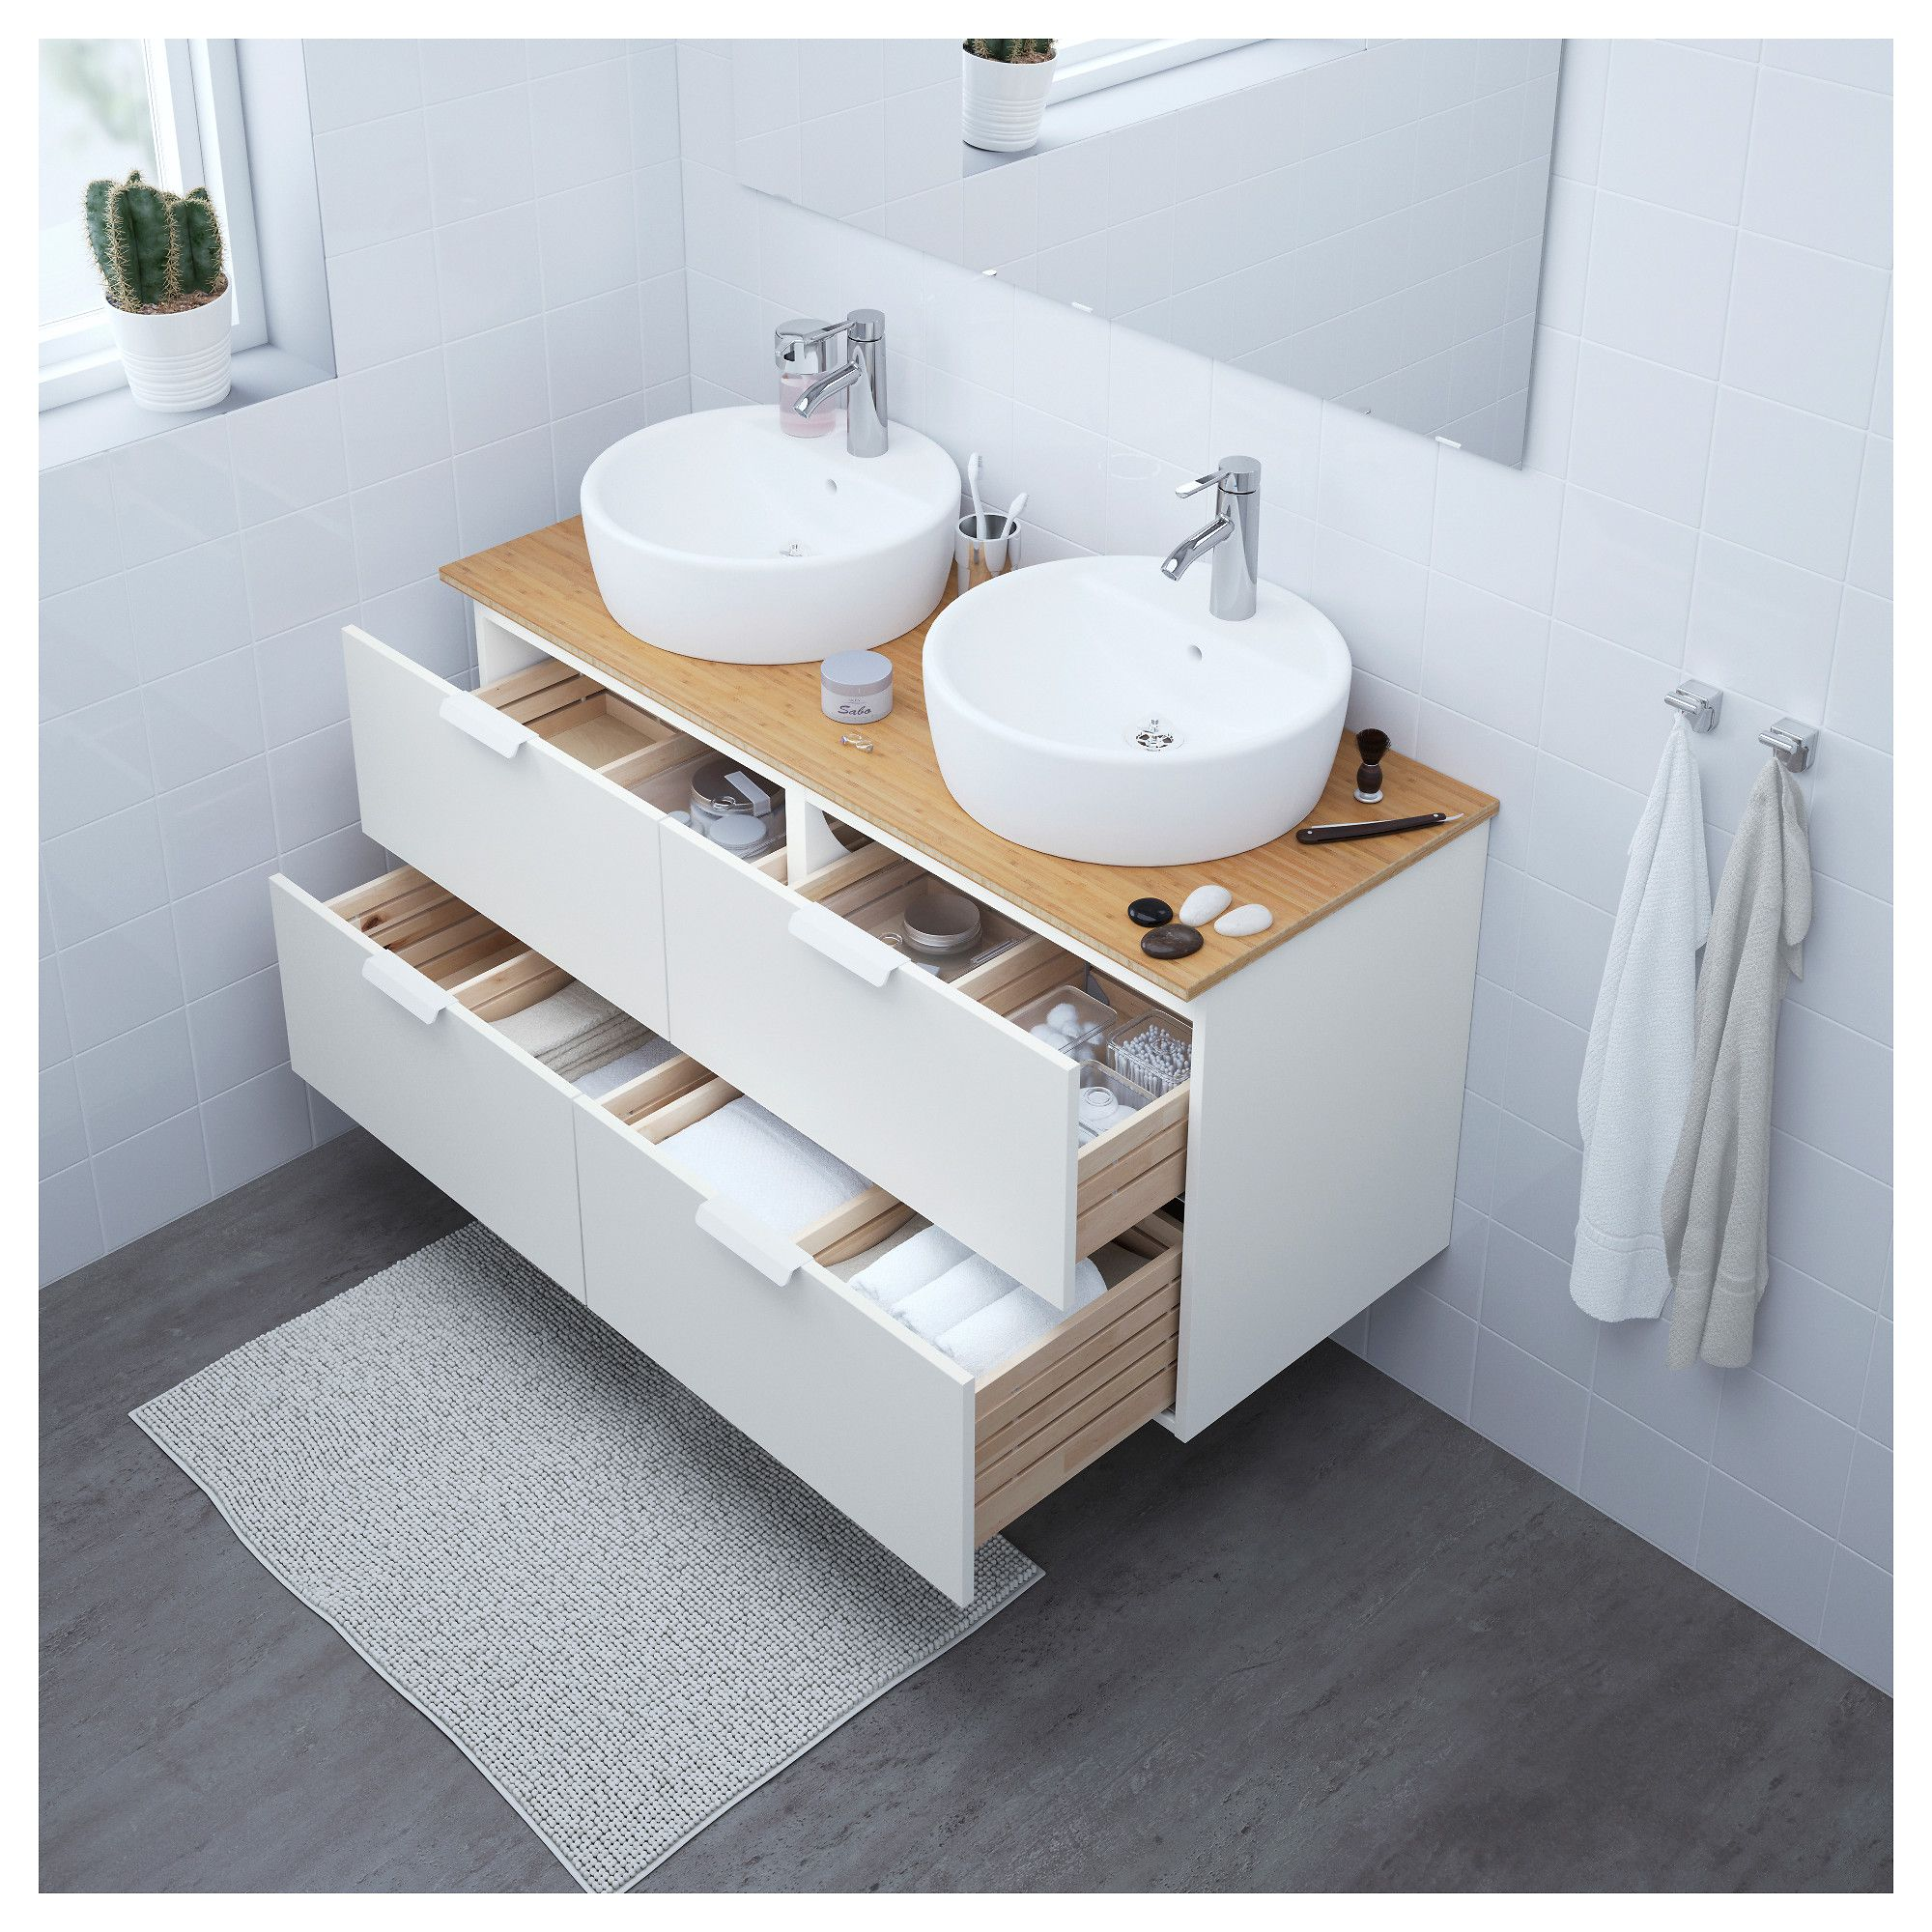 Us Furniture And Home Furnishings White Vanity Bathroom